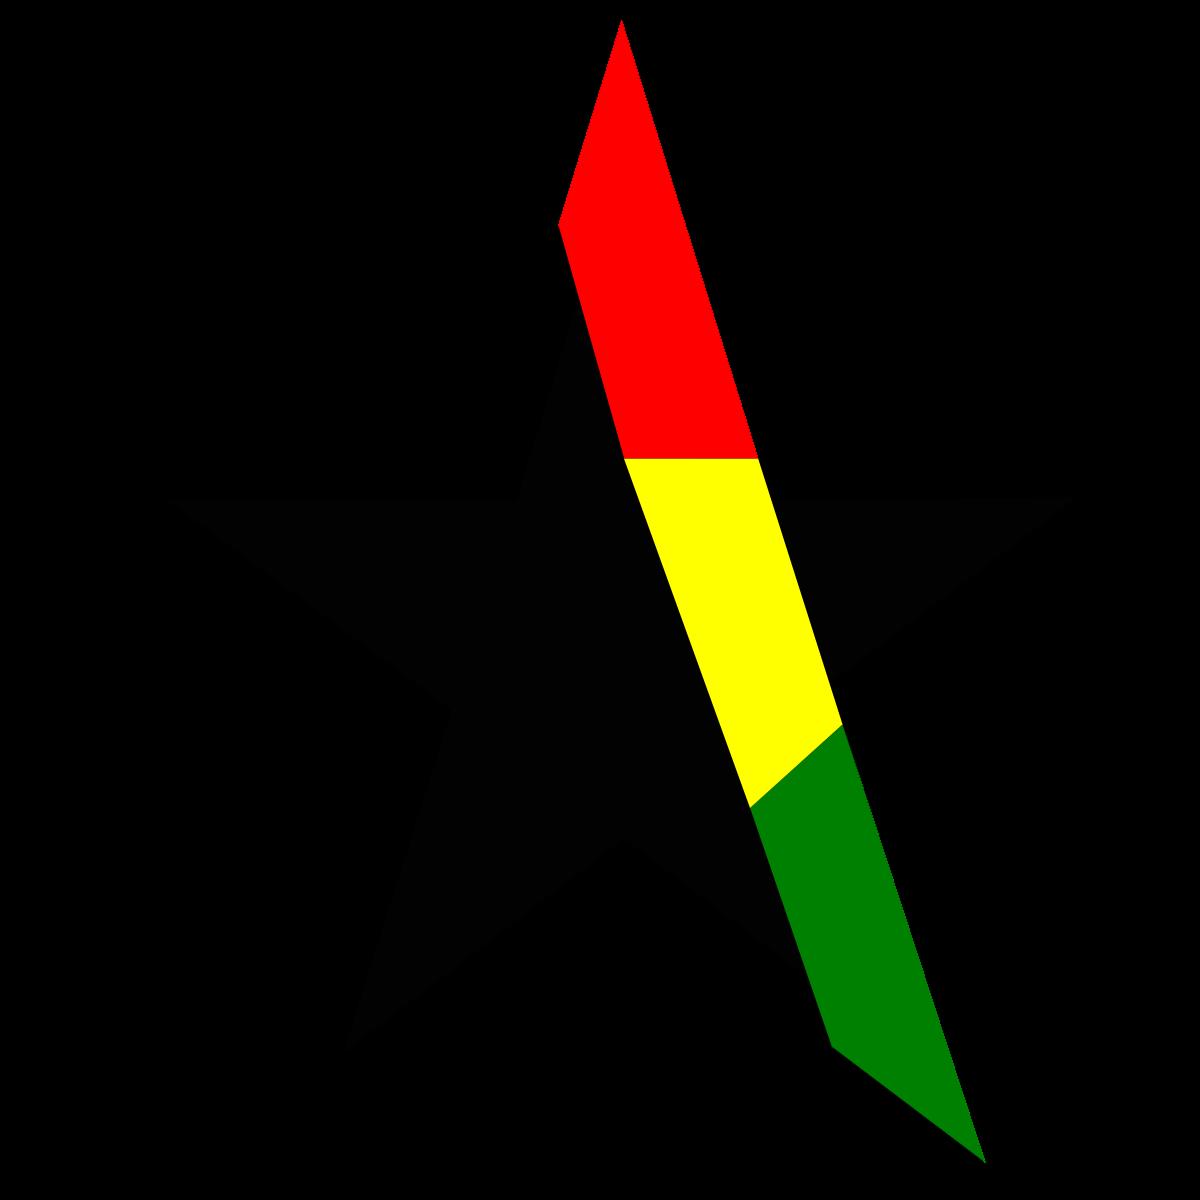 Clipart stars maroon. Black star clip art